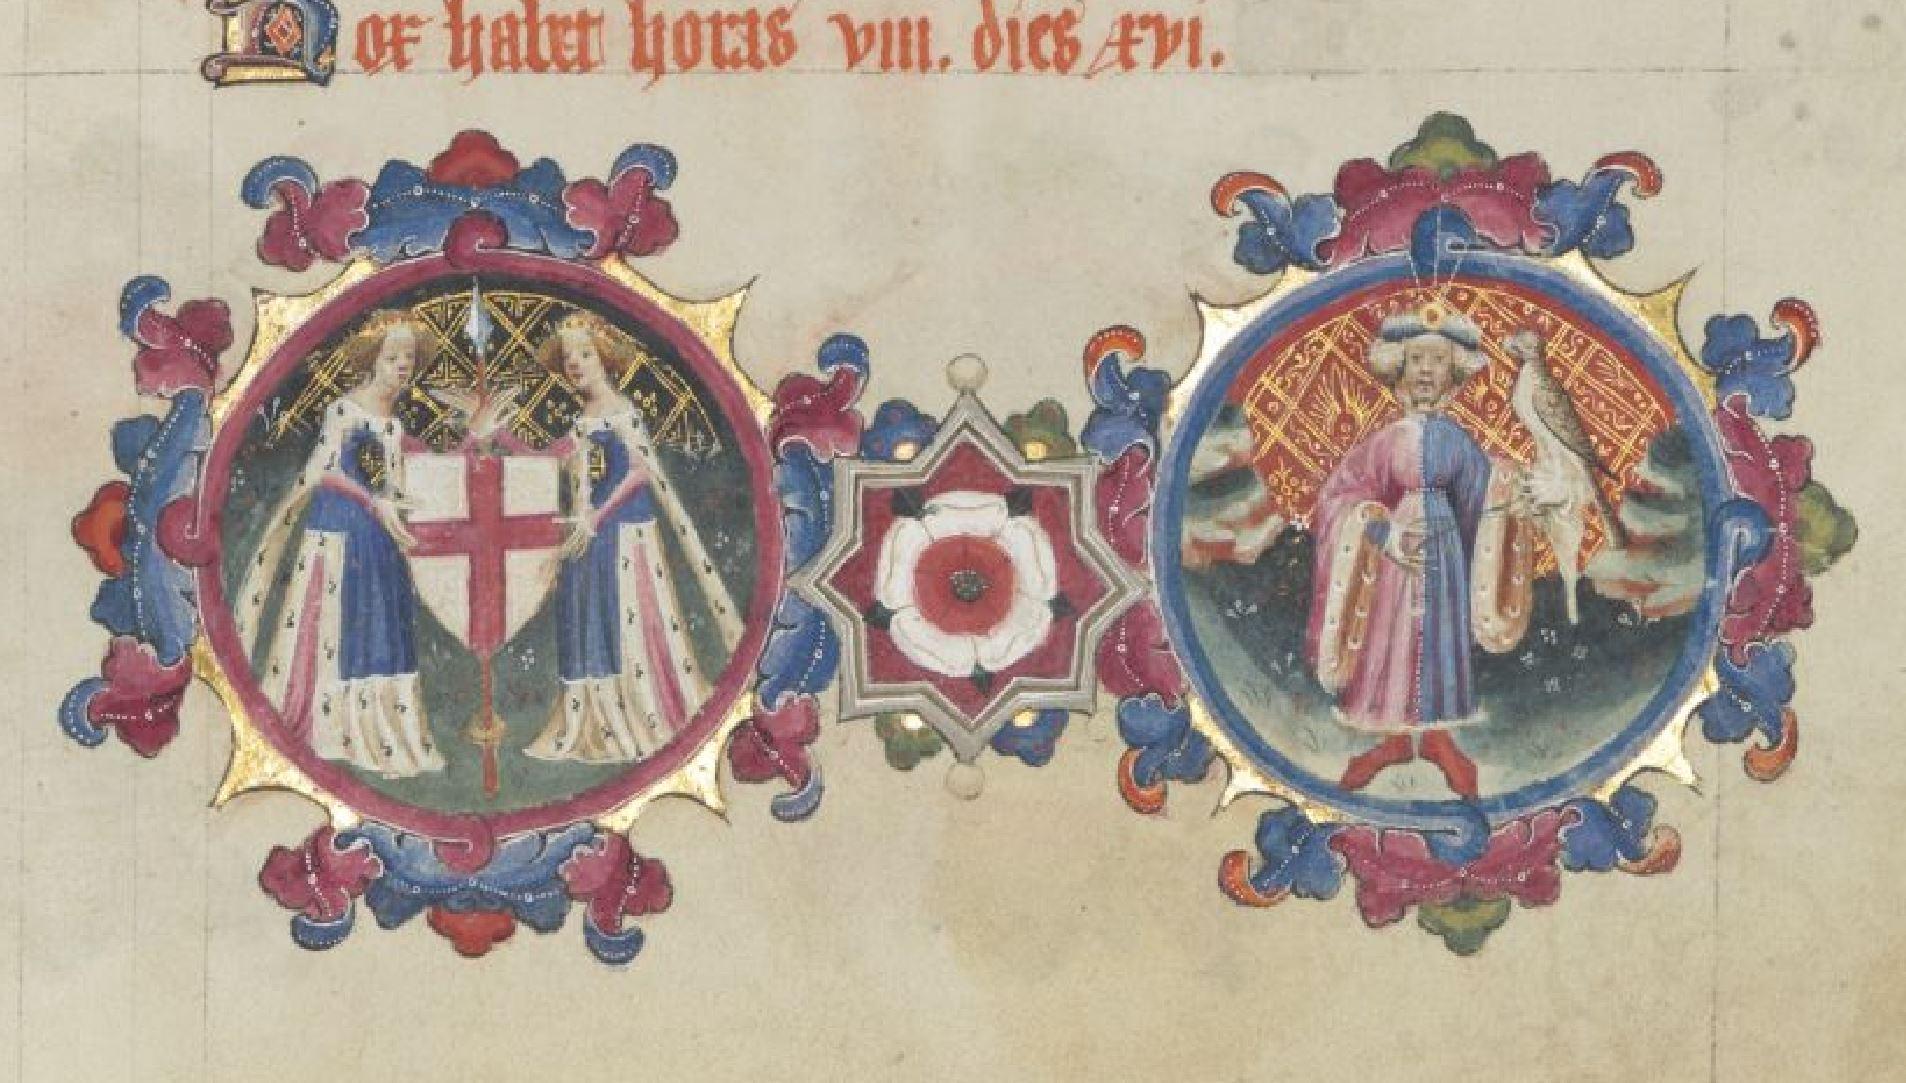 1399-1407 Sherborne Missal BL Add MS 74236 Mai p 5